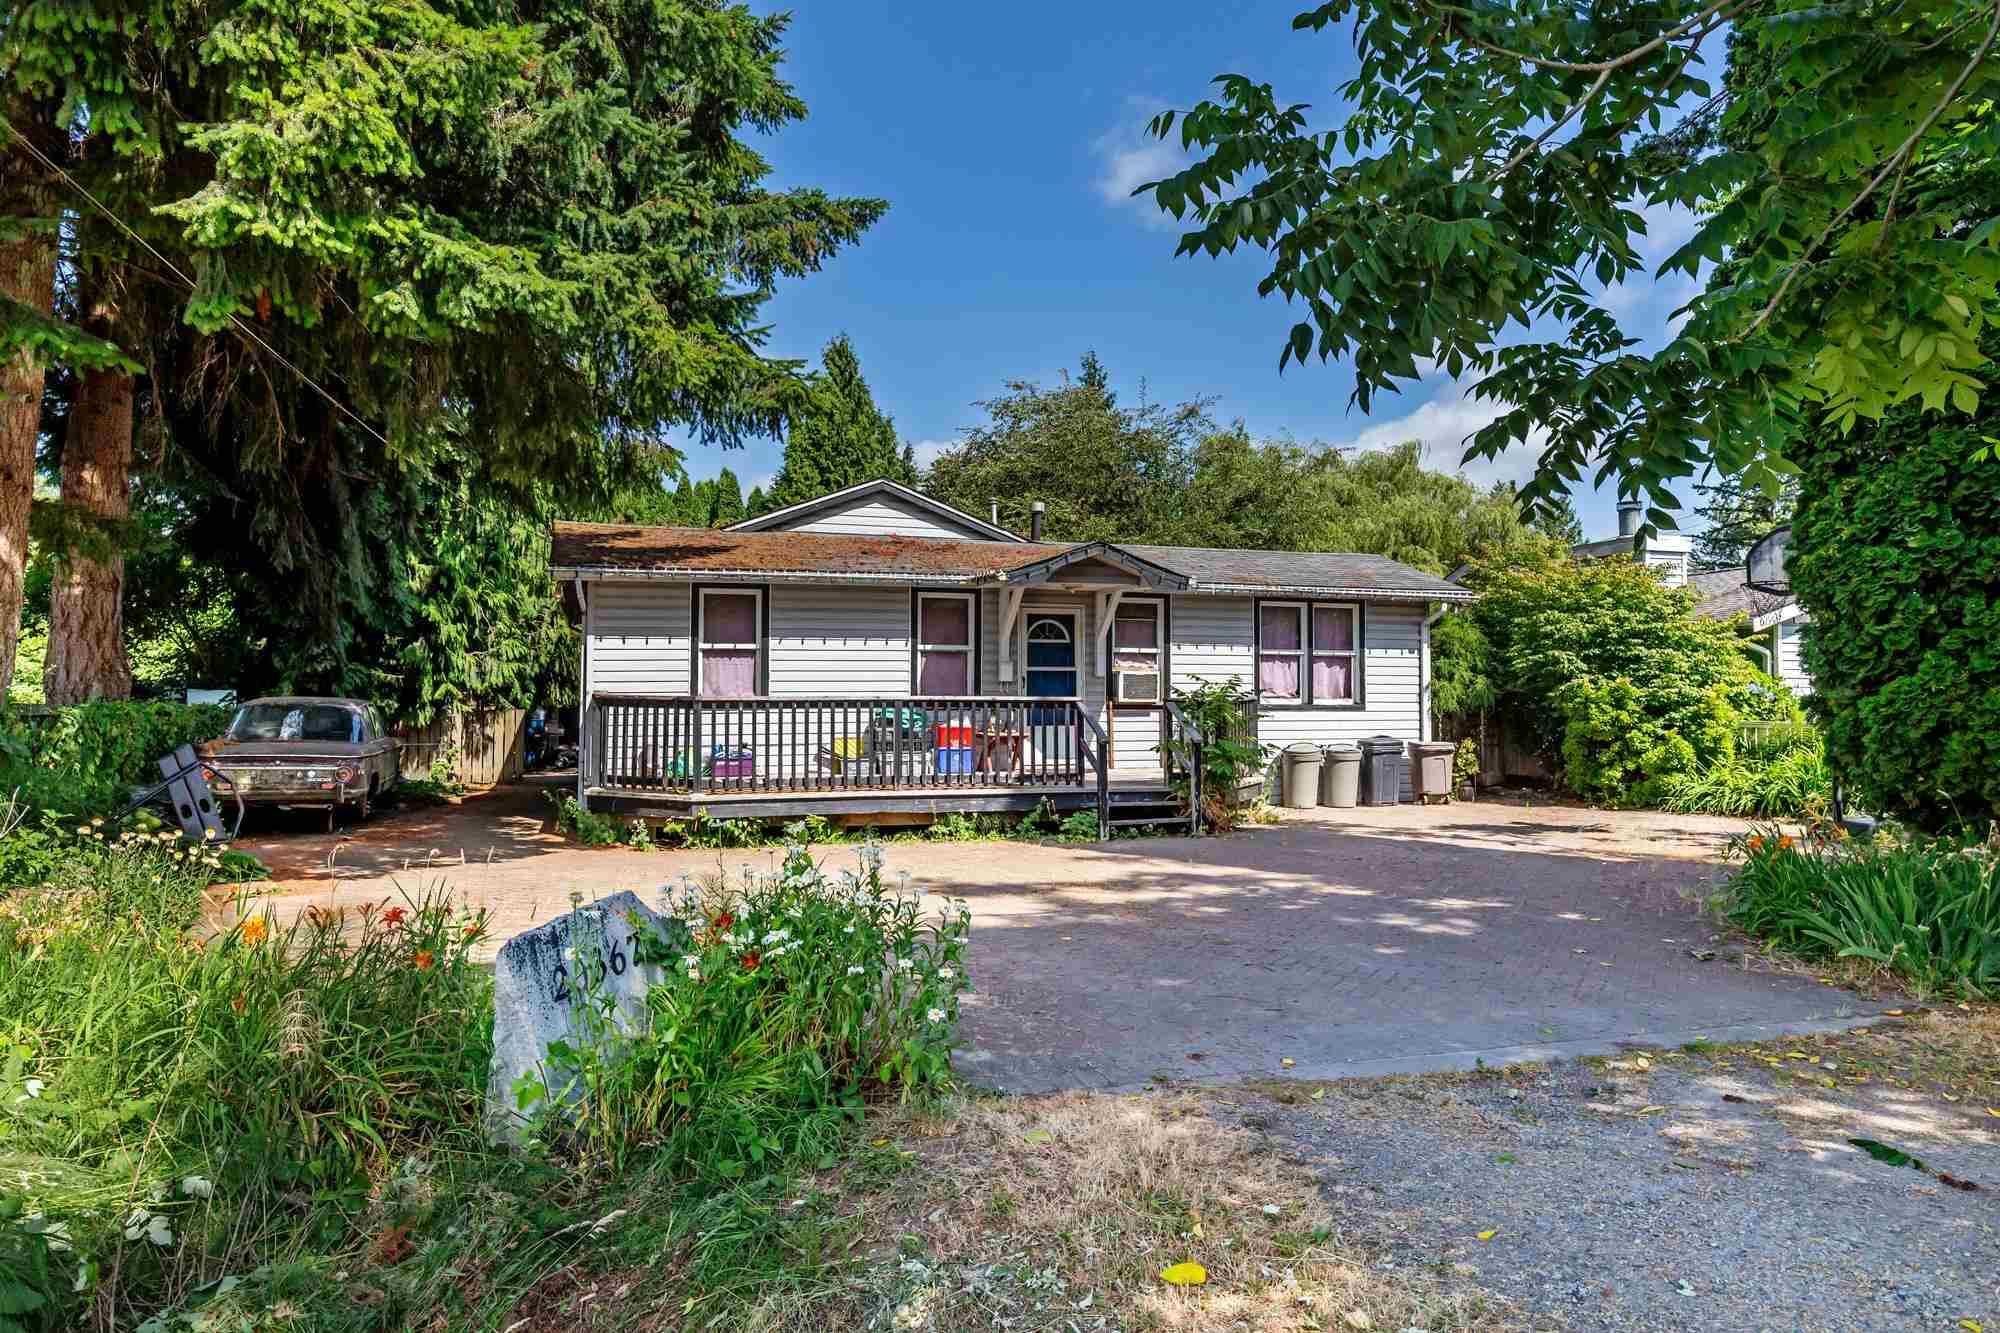 Main Photo: 20367 KENT Street in Maple Ridge: Southwest Maple Ridge House for sale : MLS®# R2602645